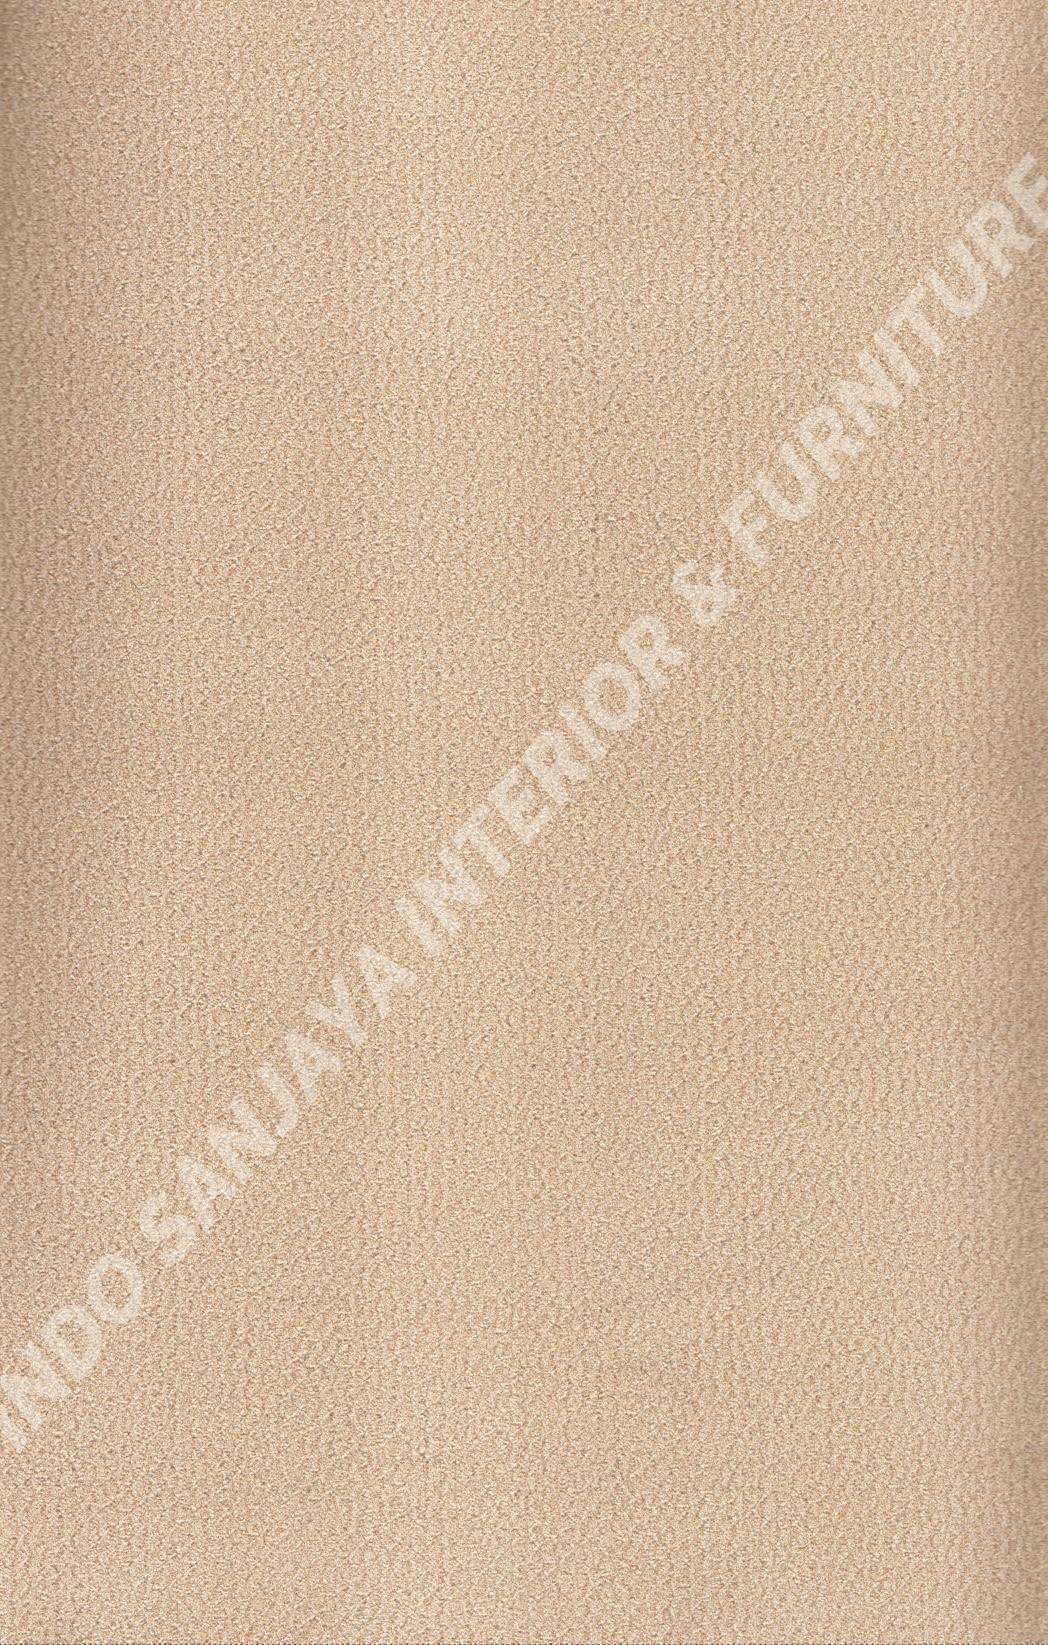 wallpaper   Wallpaper Minimalis Polos 5015-4:5015-4 corak  warna